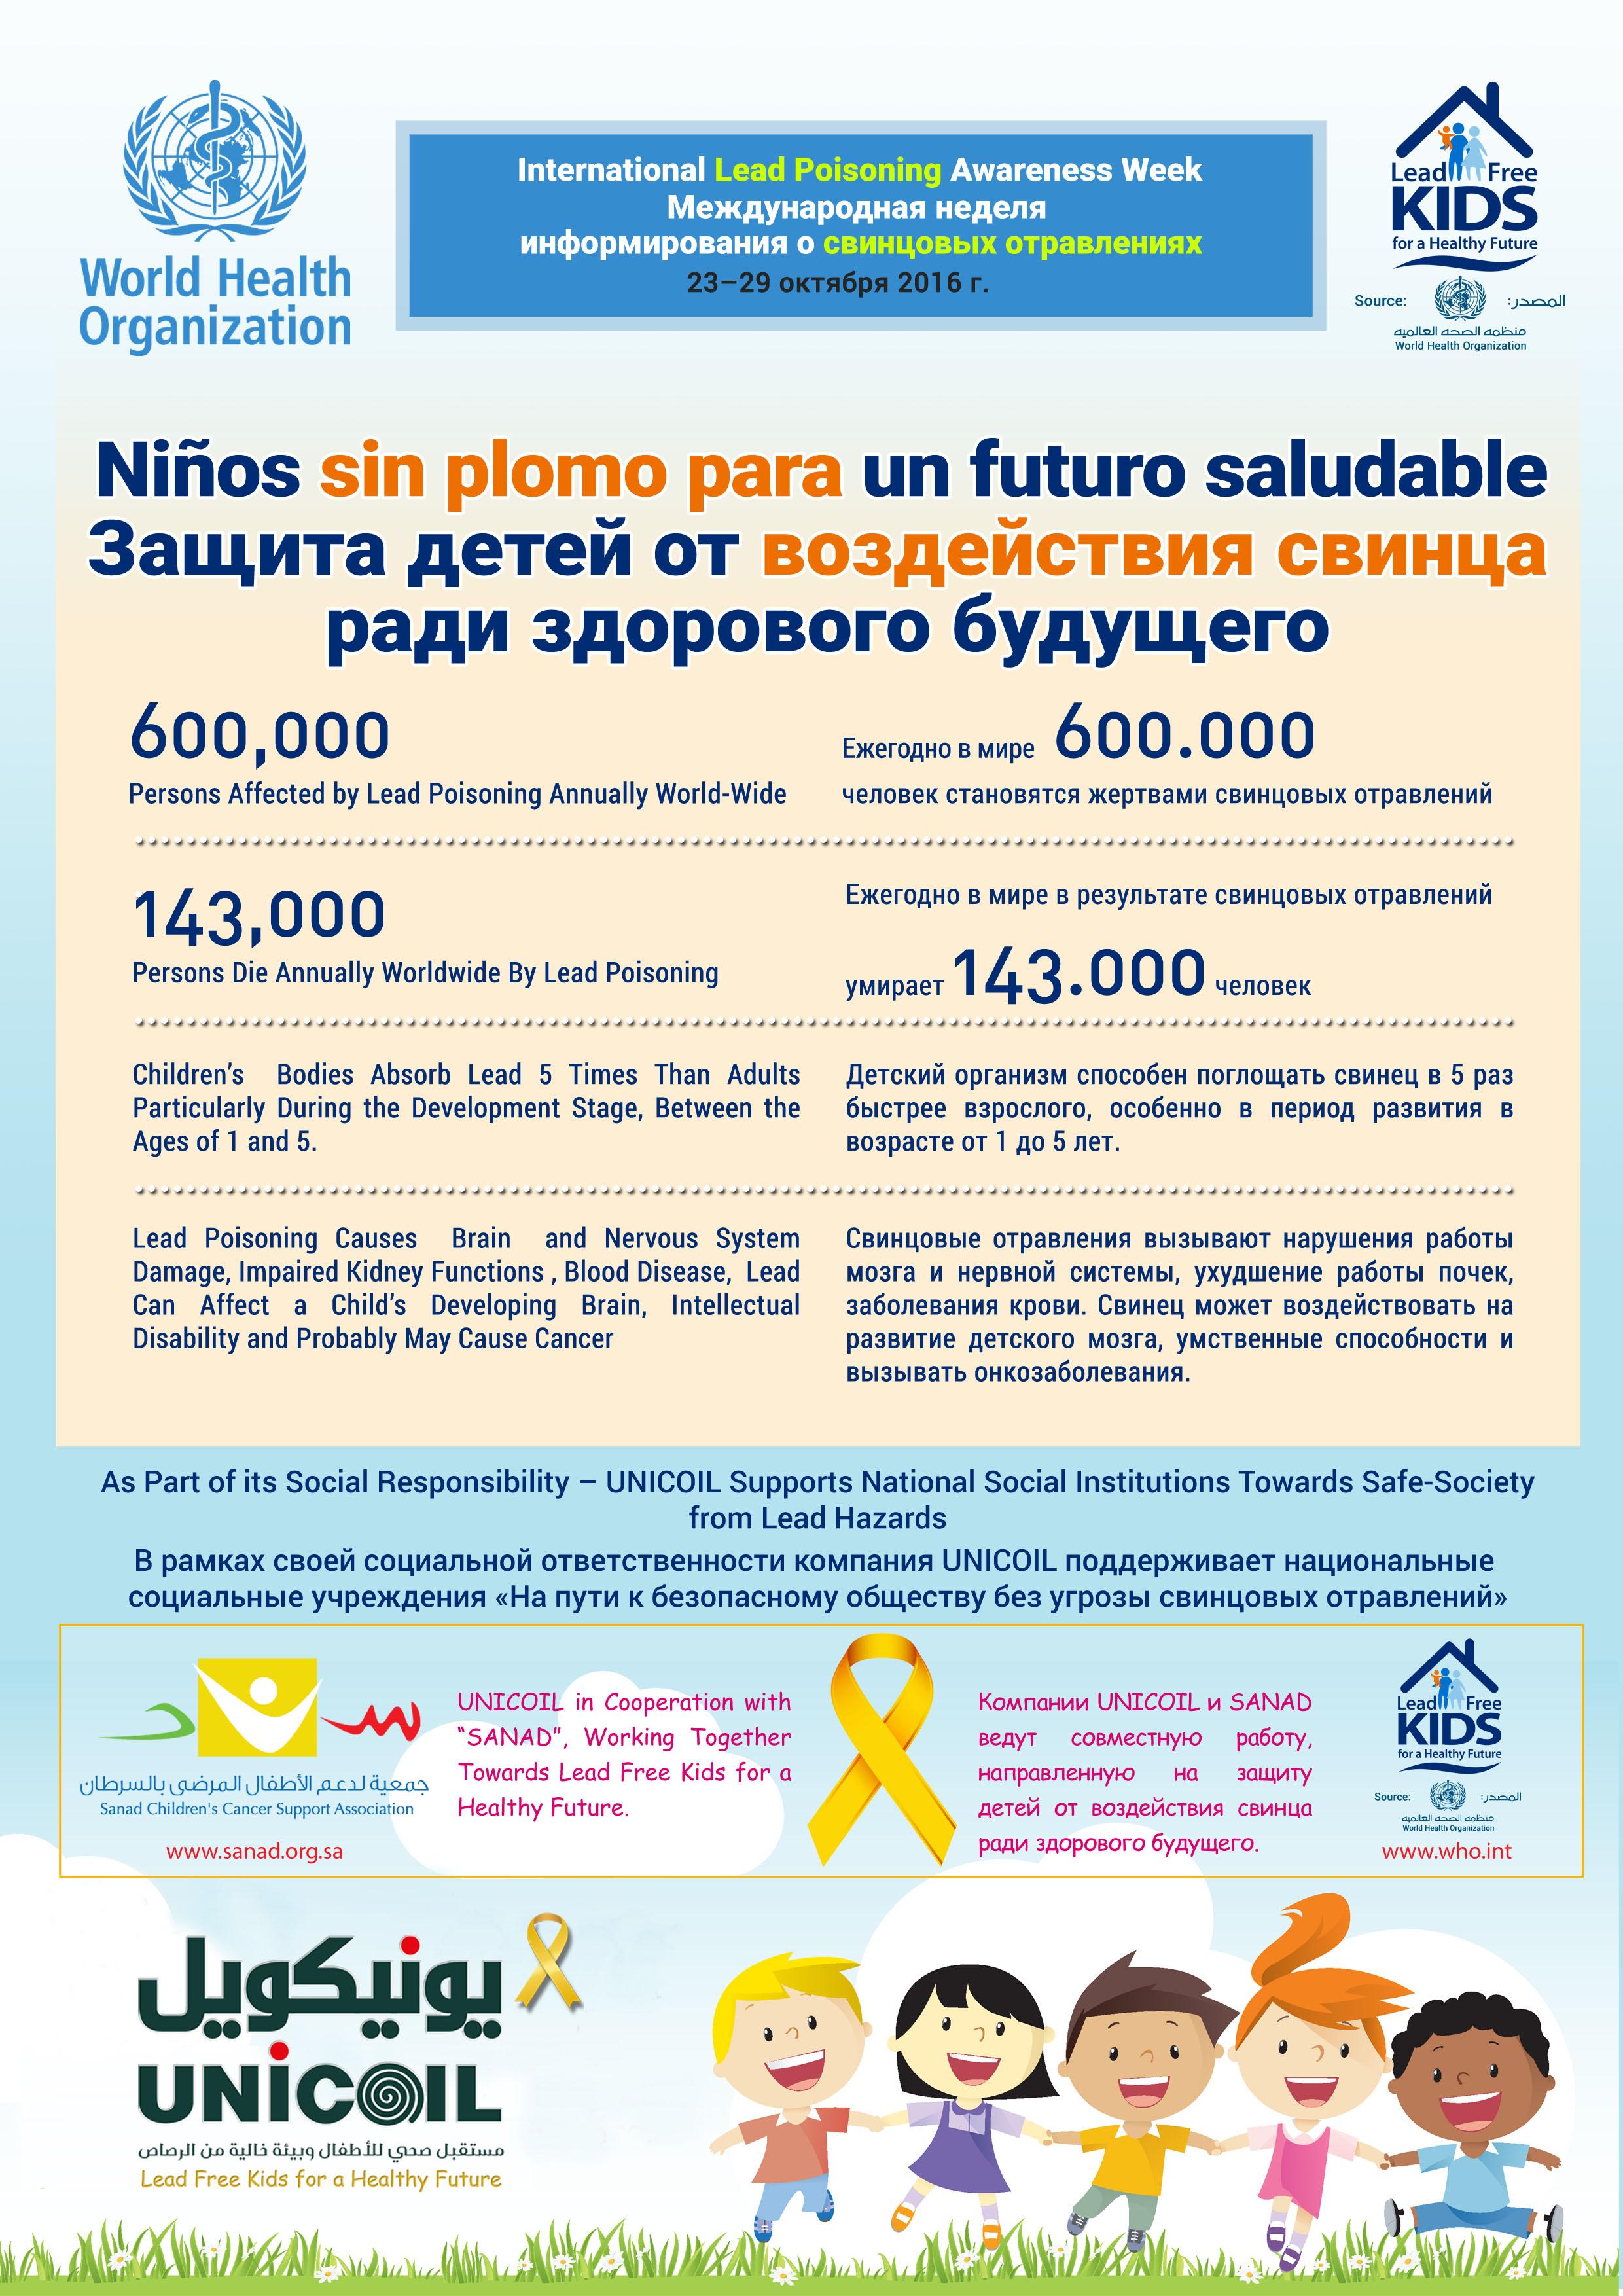 International Lead Poisoning Awareness Week